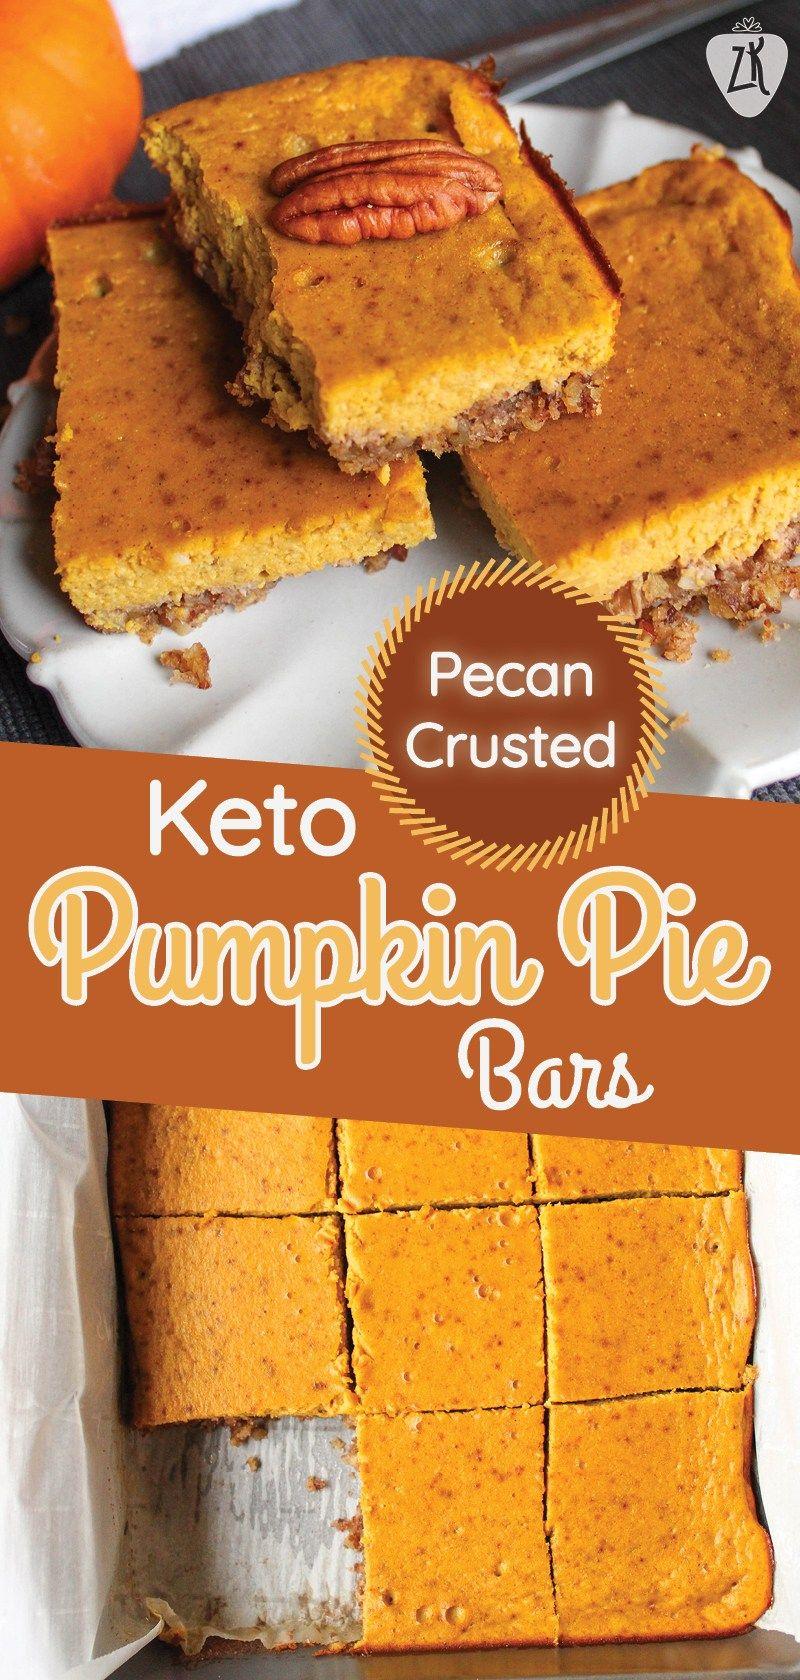 Pecan Crusted Pumpkin Pie Bars Recipe Pumpkin Pie Bars Keto